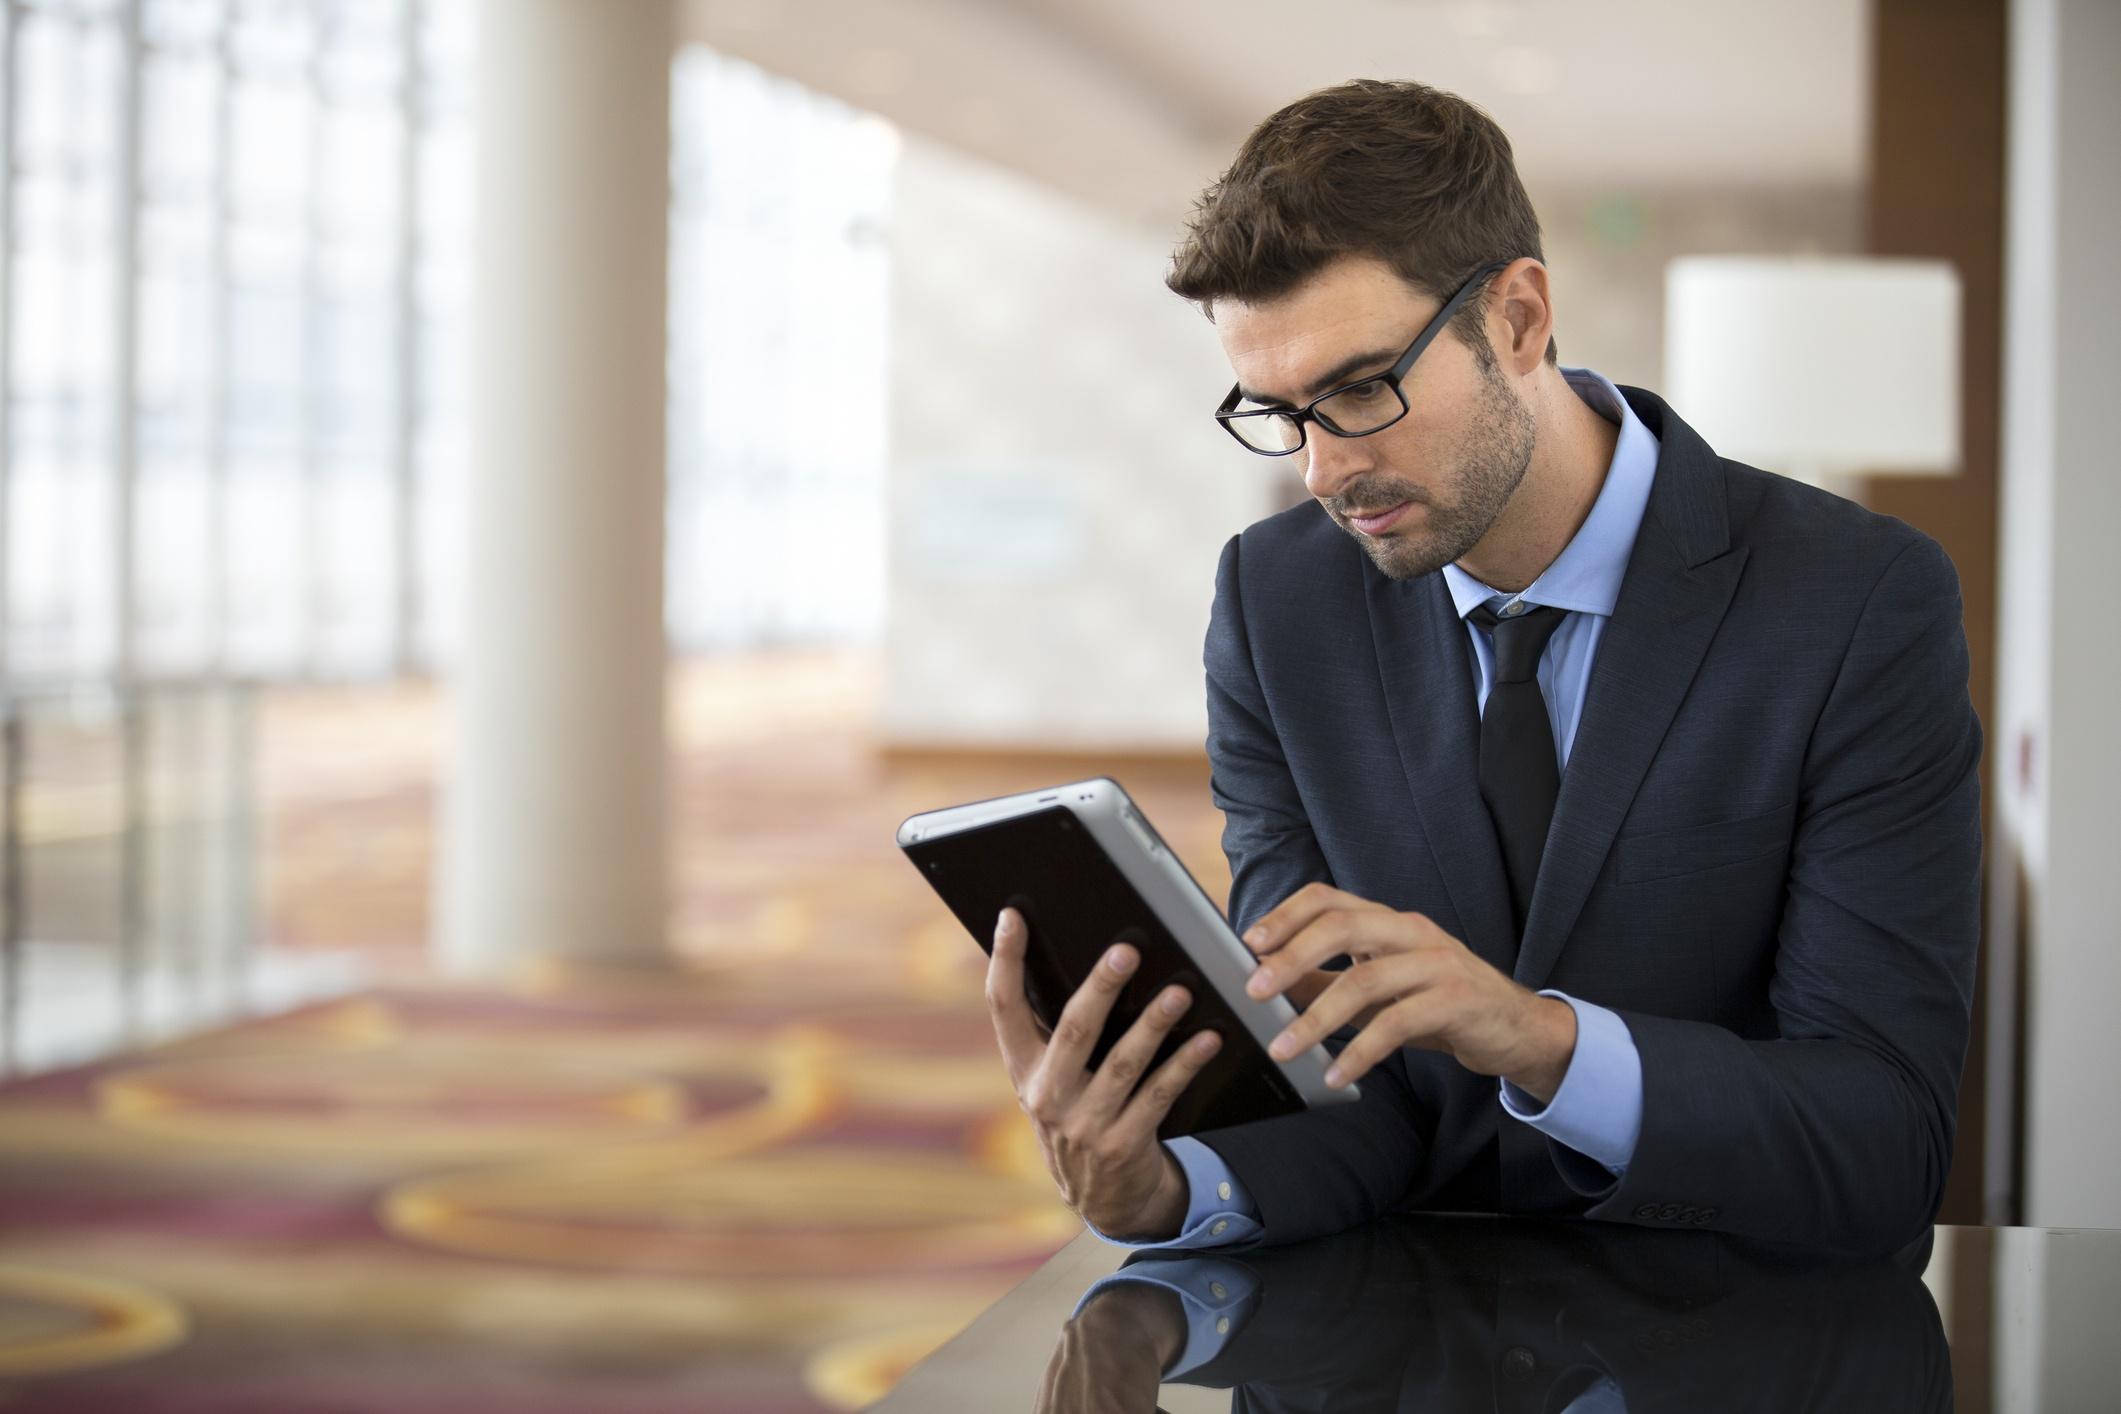 Focused Businessman Using a Tablet